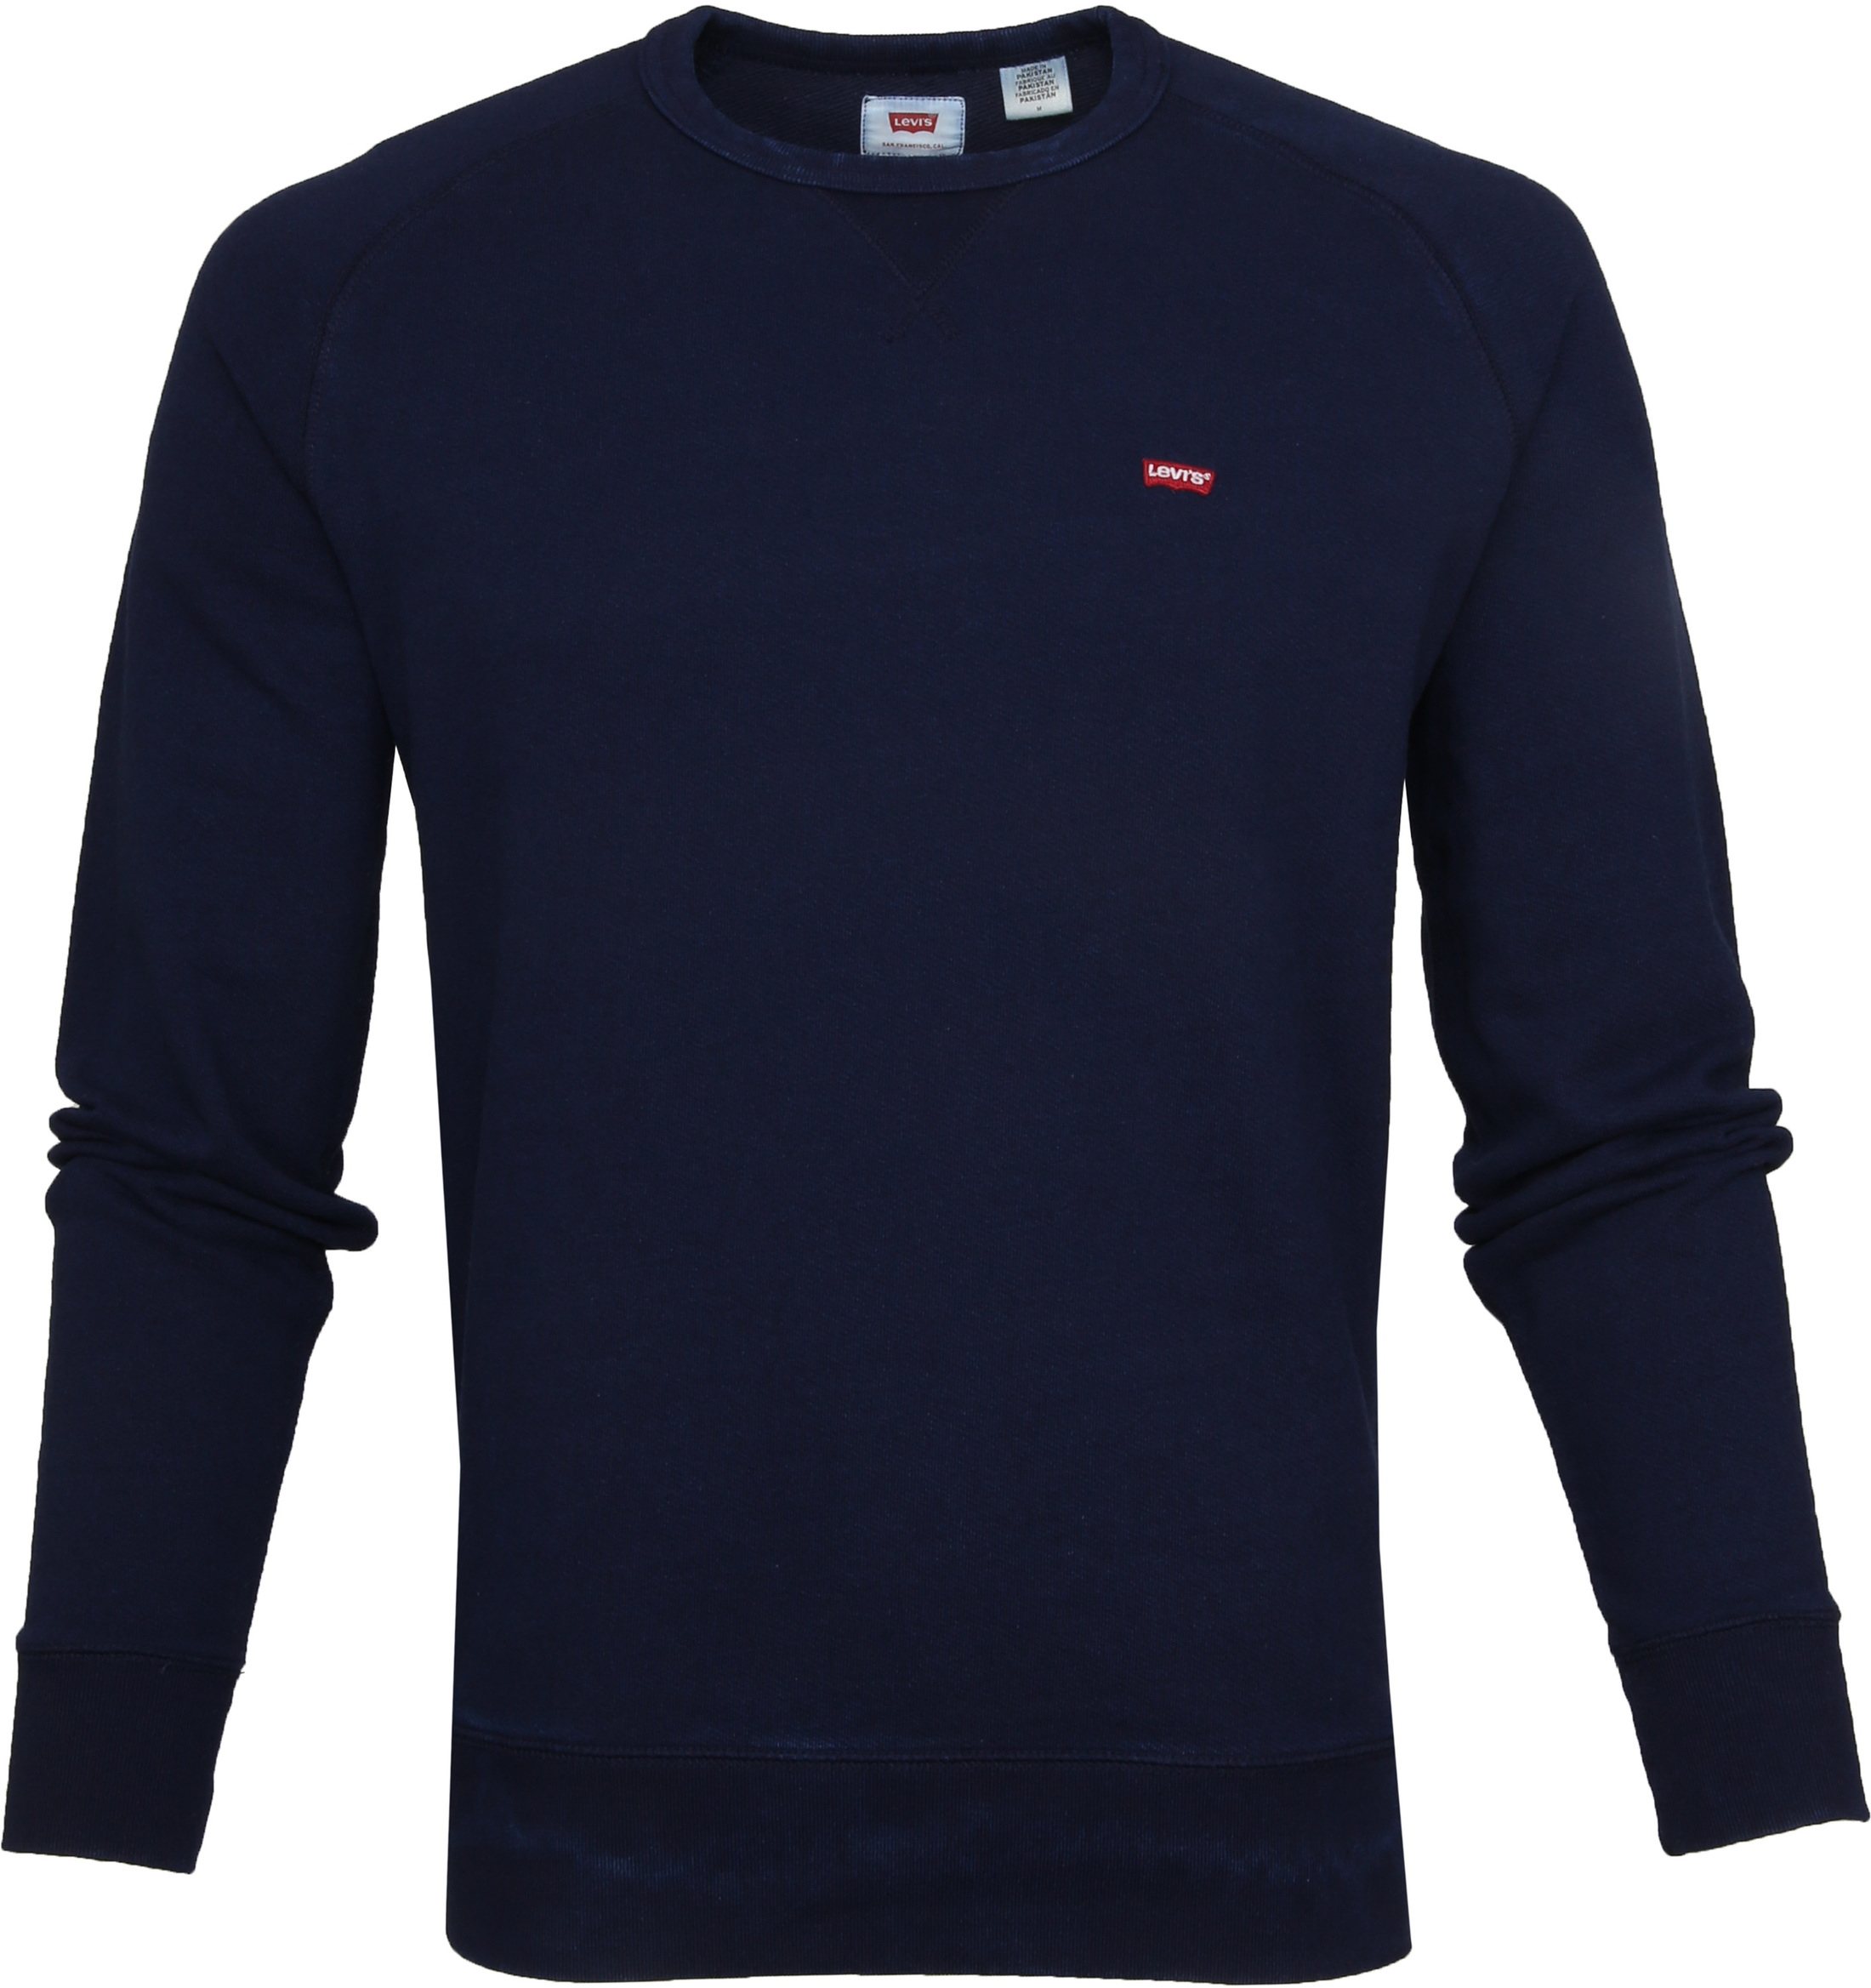 Levi's Original Sweater Navy photo 0